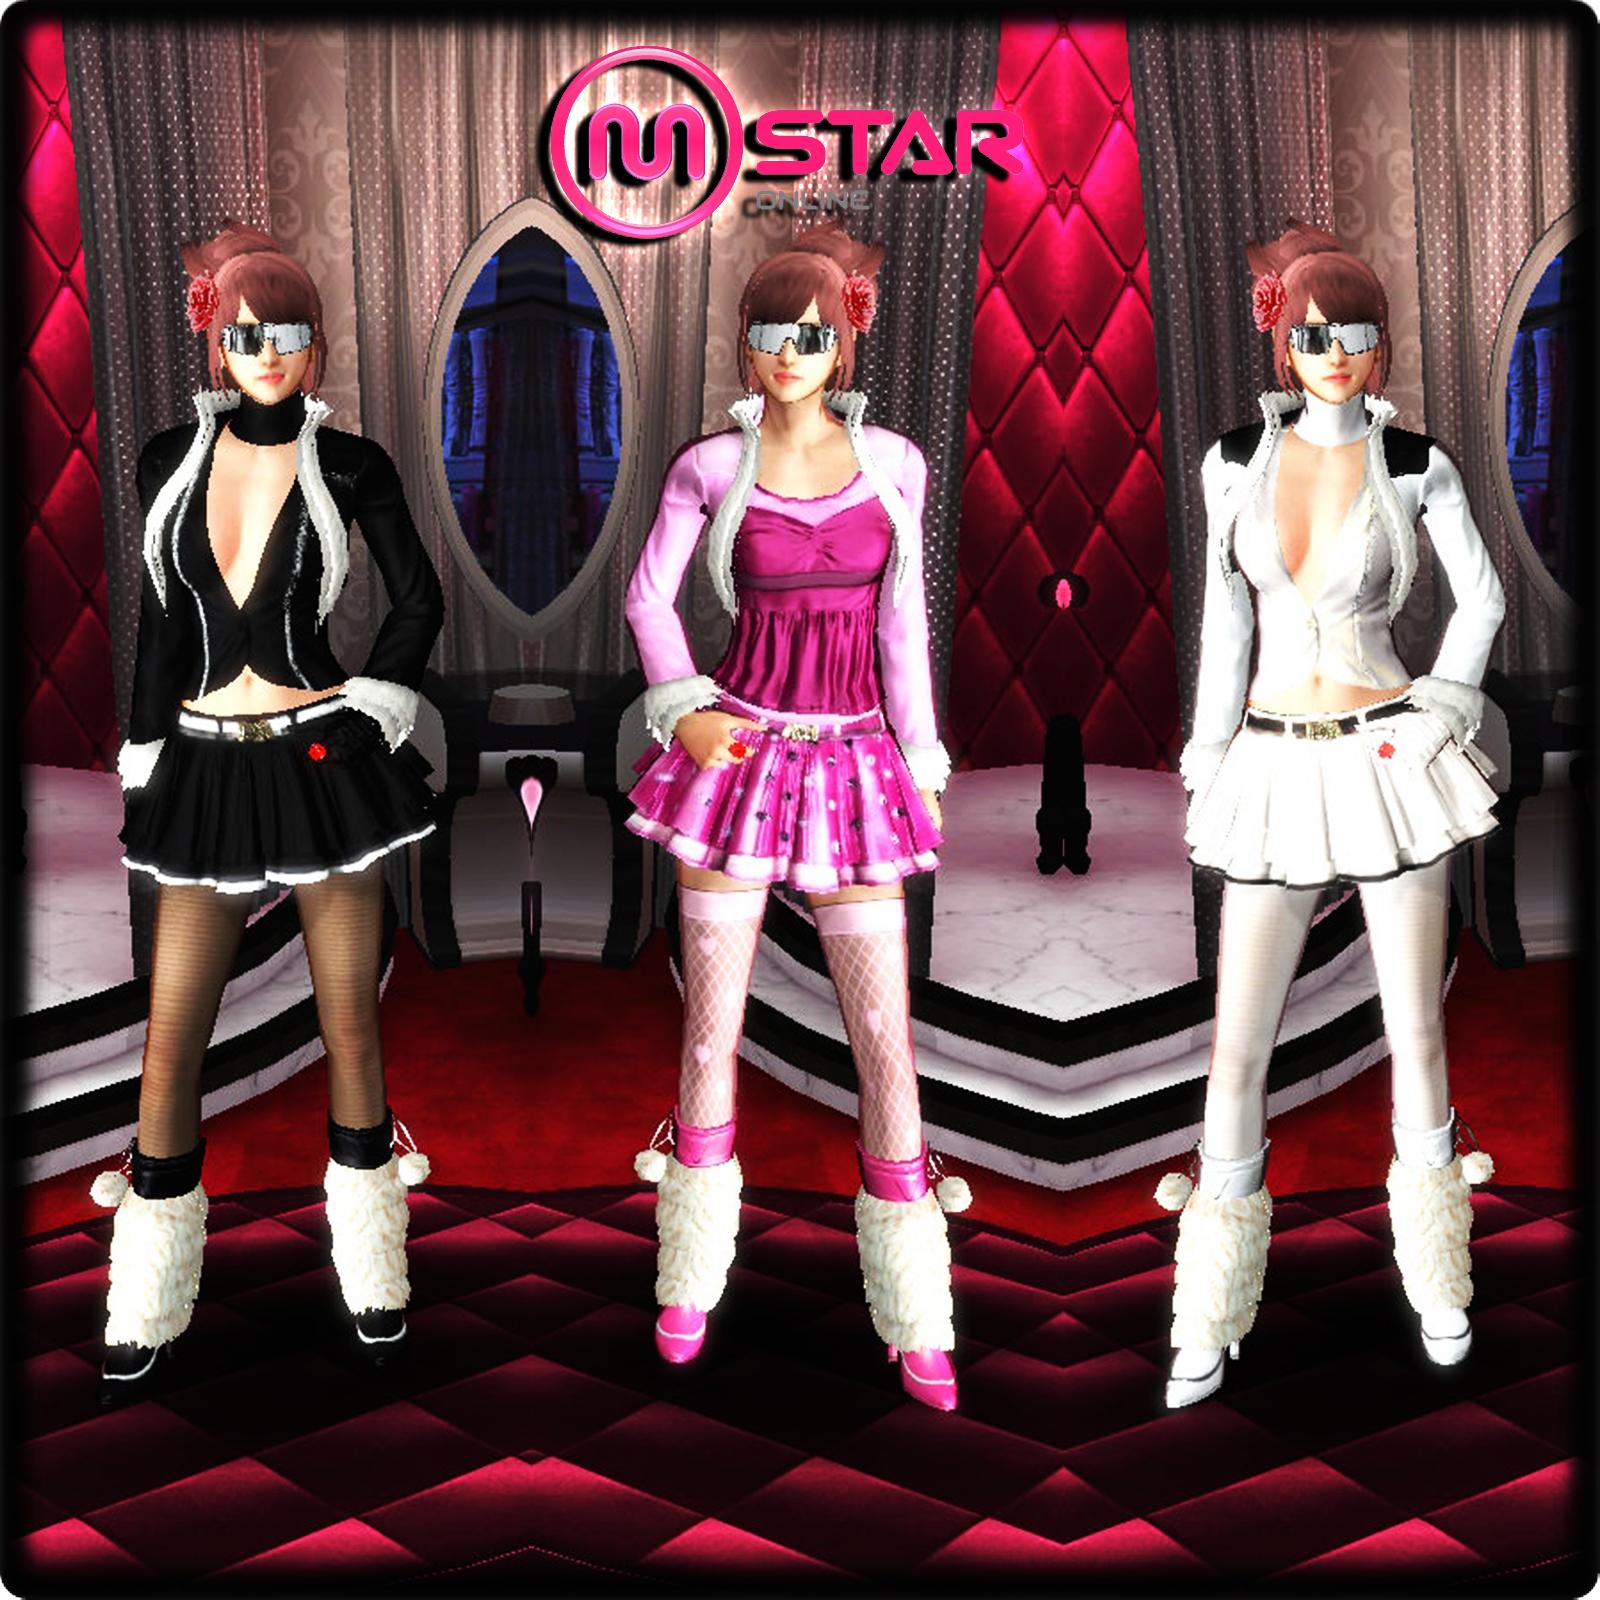 mstar_fashion_style_2_by_dark_devil_fox-d5yv4ks.png